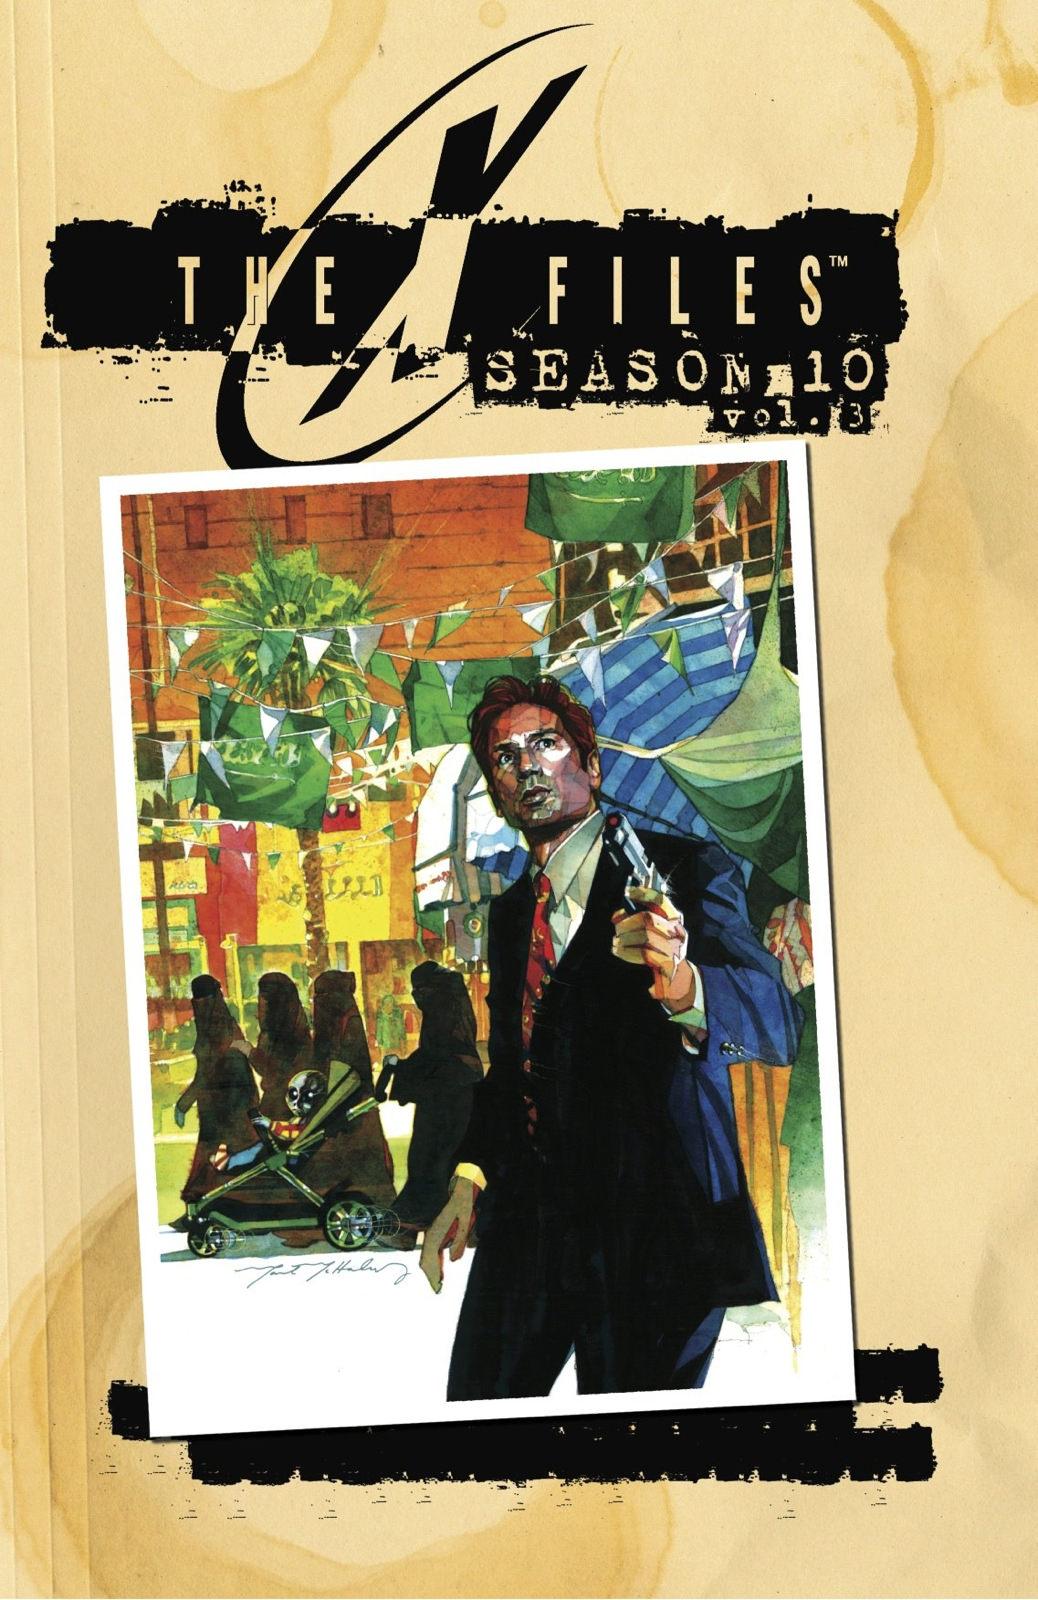 X Files Season 10: Vol. 3